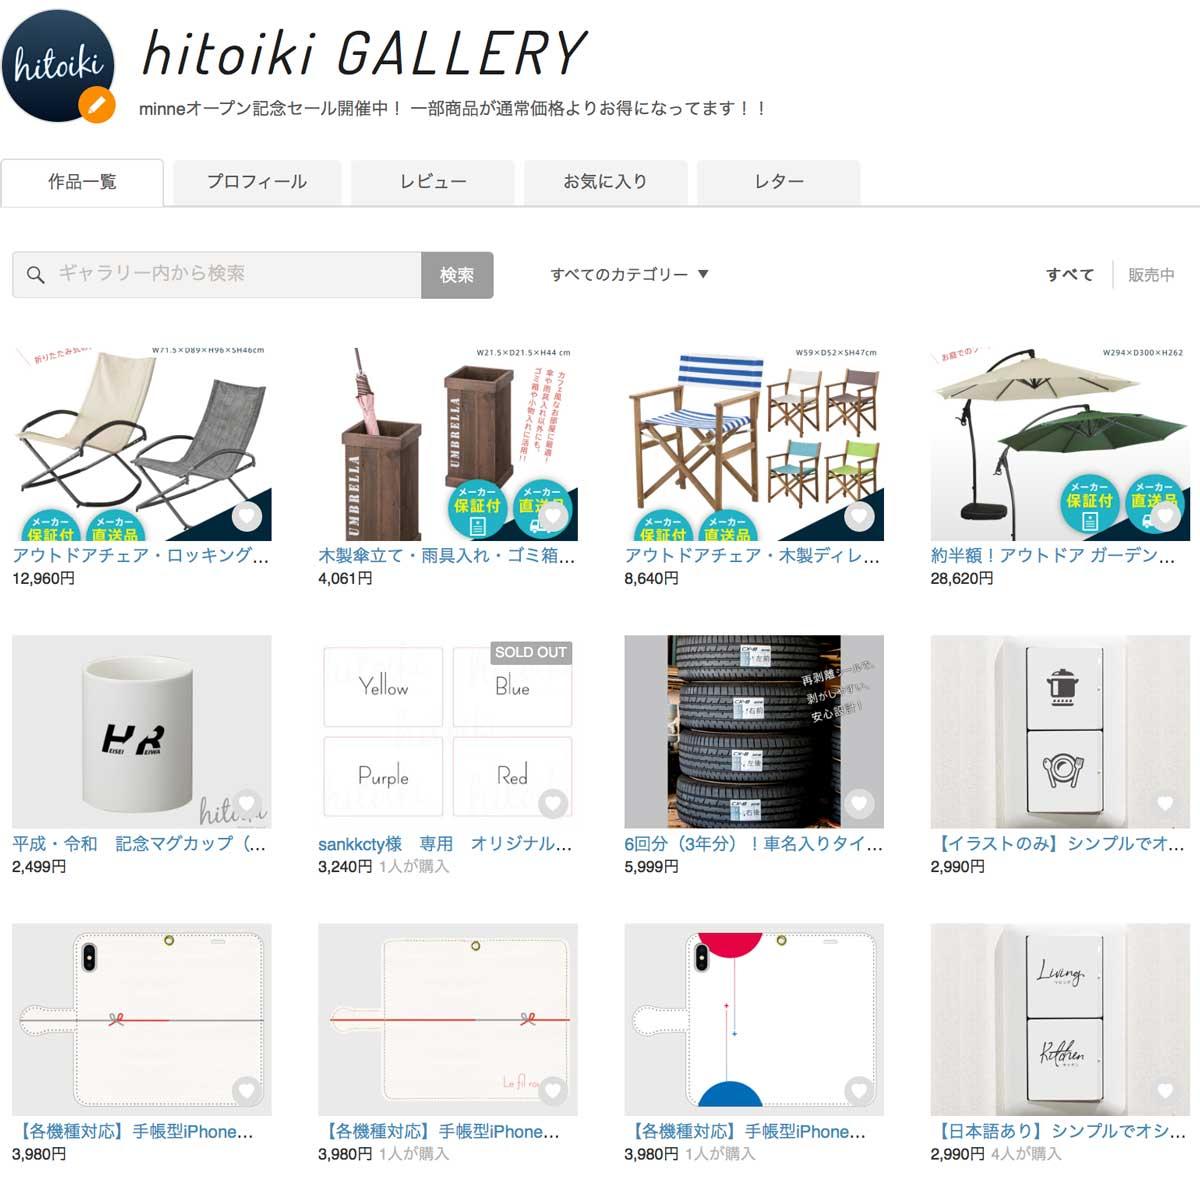 hitoiki(ひといき)運営の公式通販ショップ一覧!Yahoo!や楽天市場、Amazonにも展開中! hitoiki_onlineshop_minne